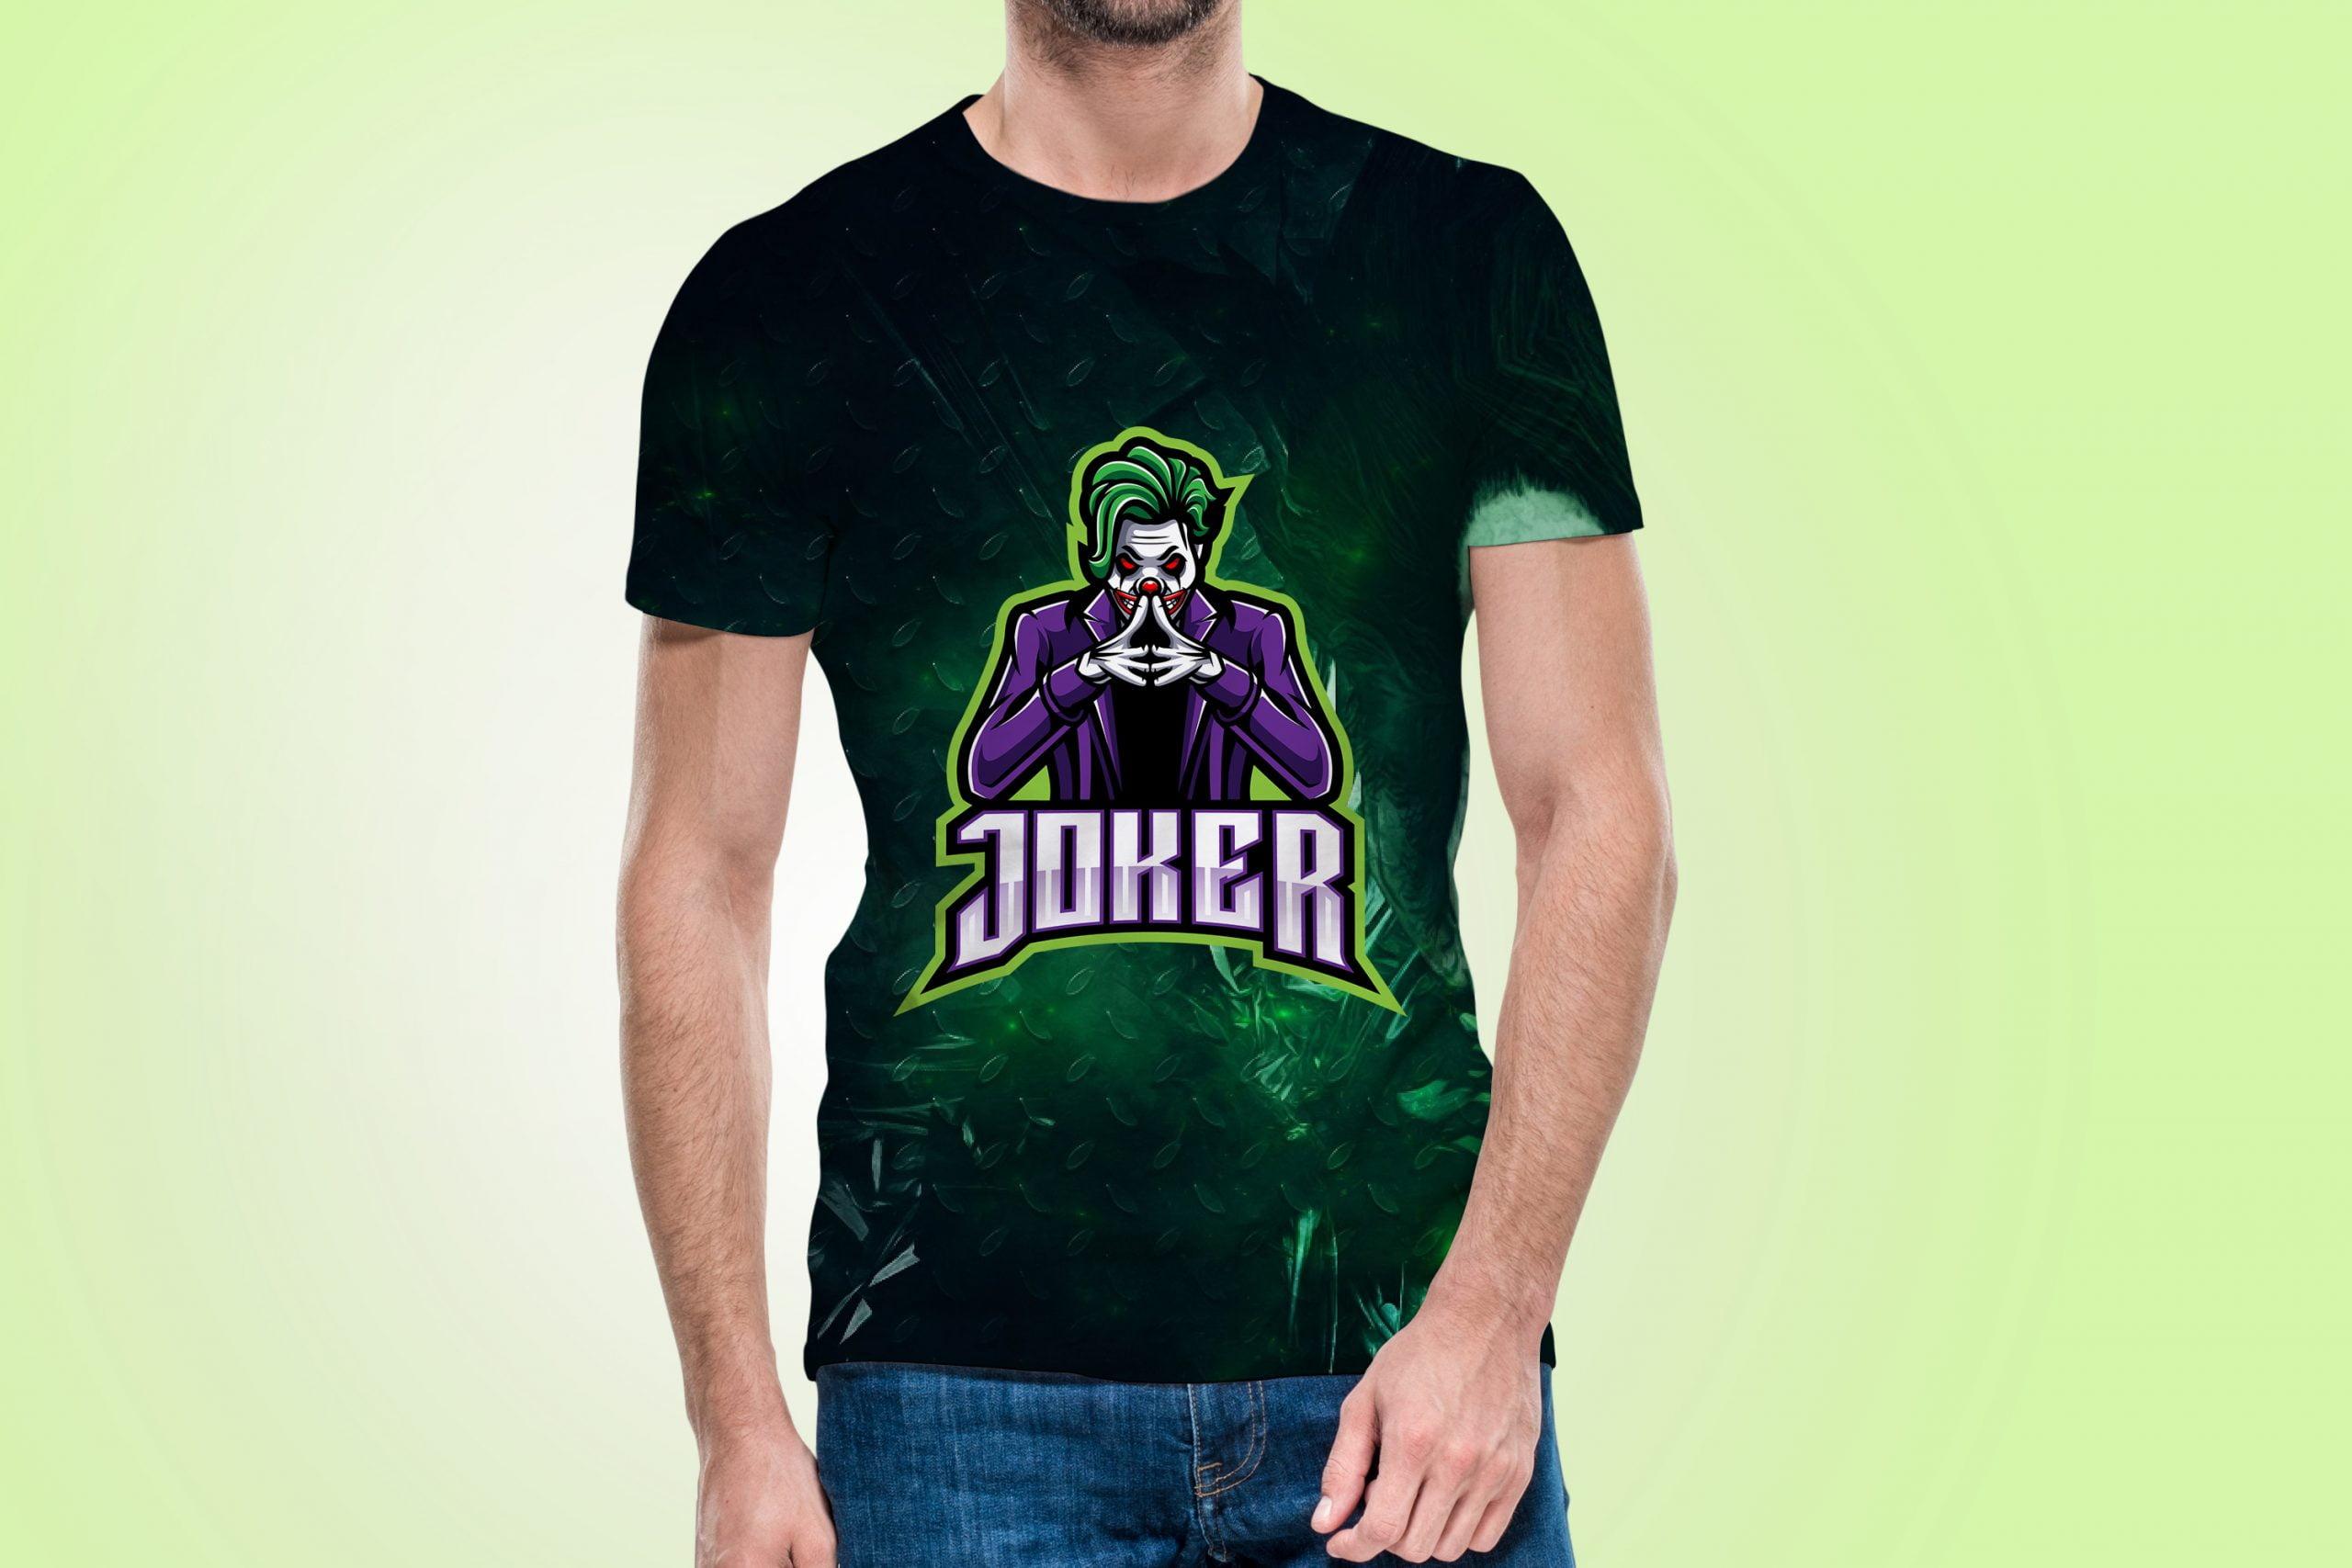 Free-Joker-Logo-Mascot-Mockup-T-Shirt